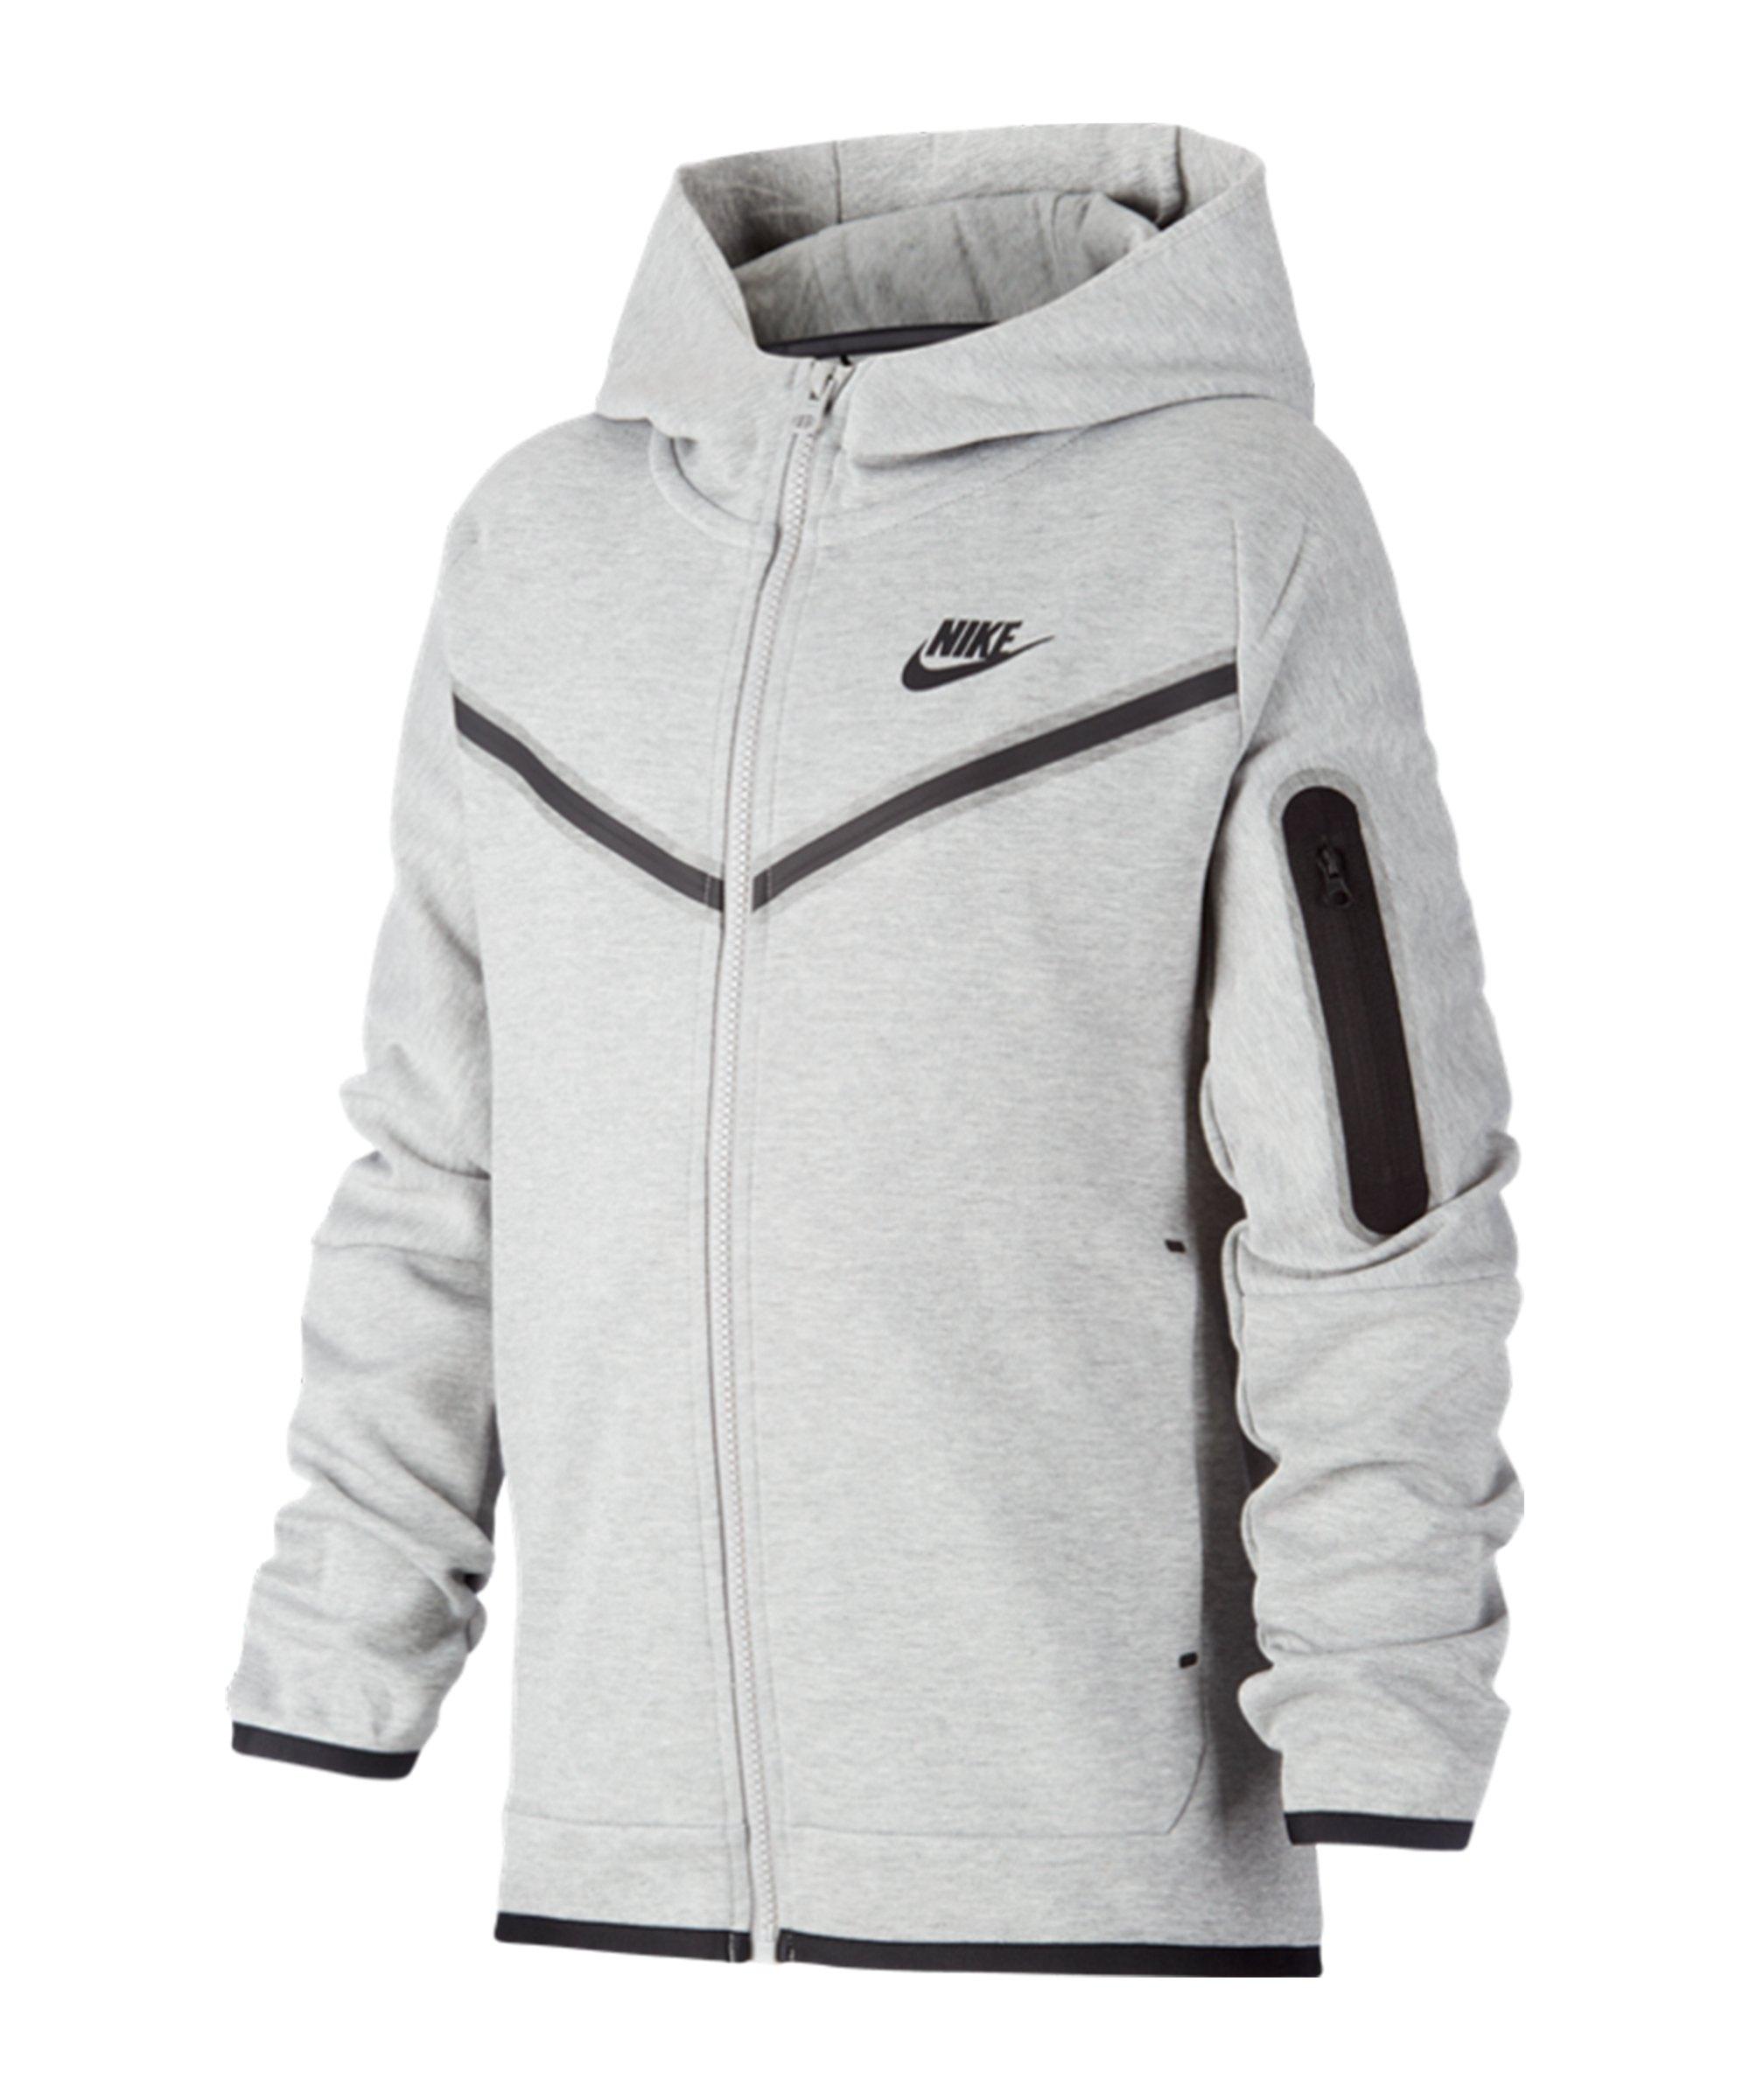 Nike Tech Fleece Jacke Kids Grau Schwarz F063 - grau